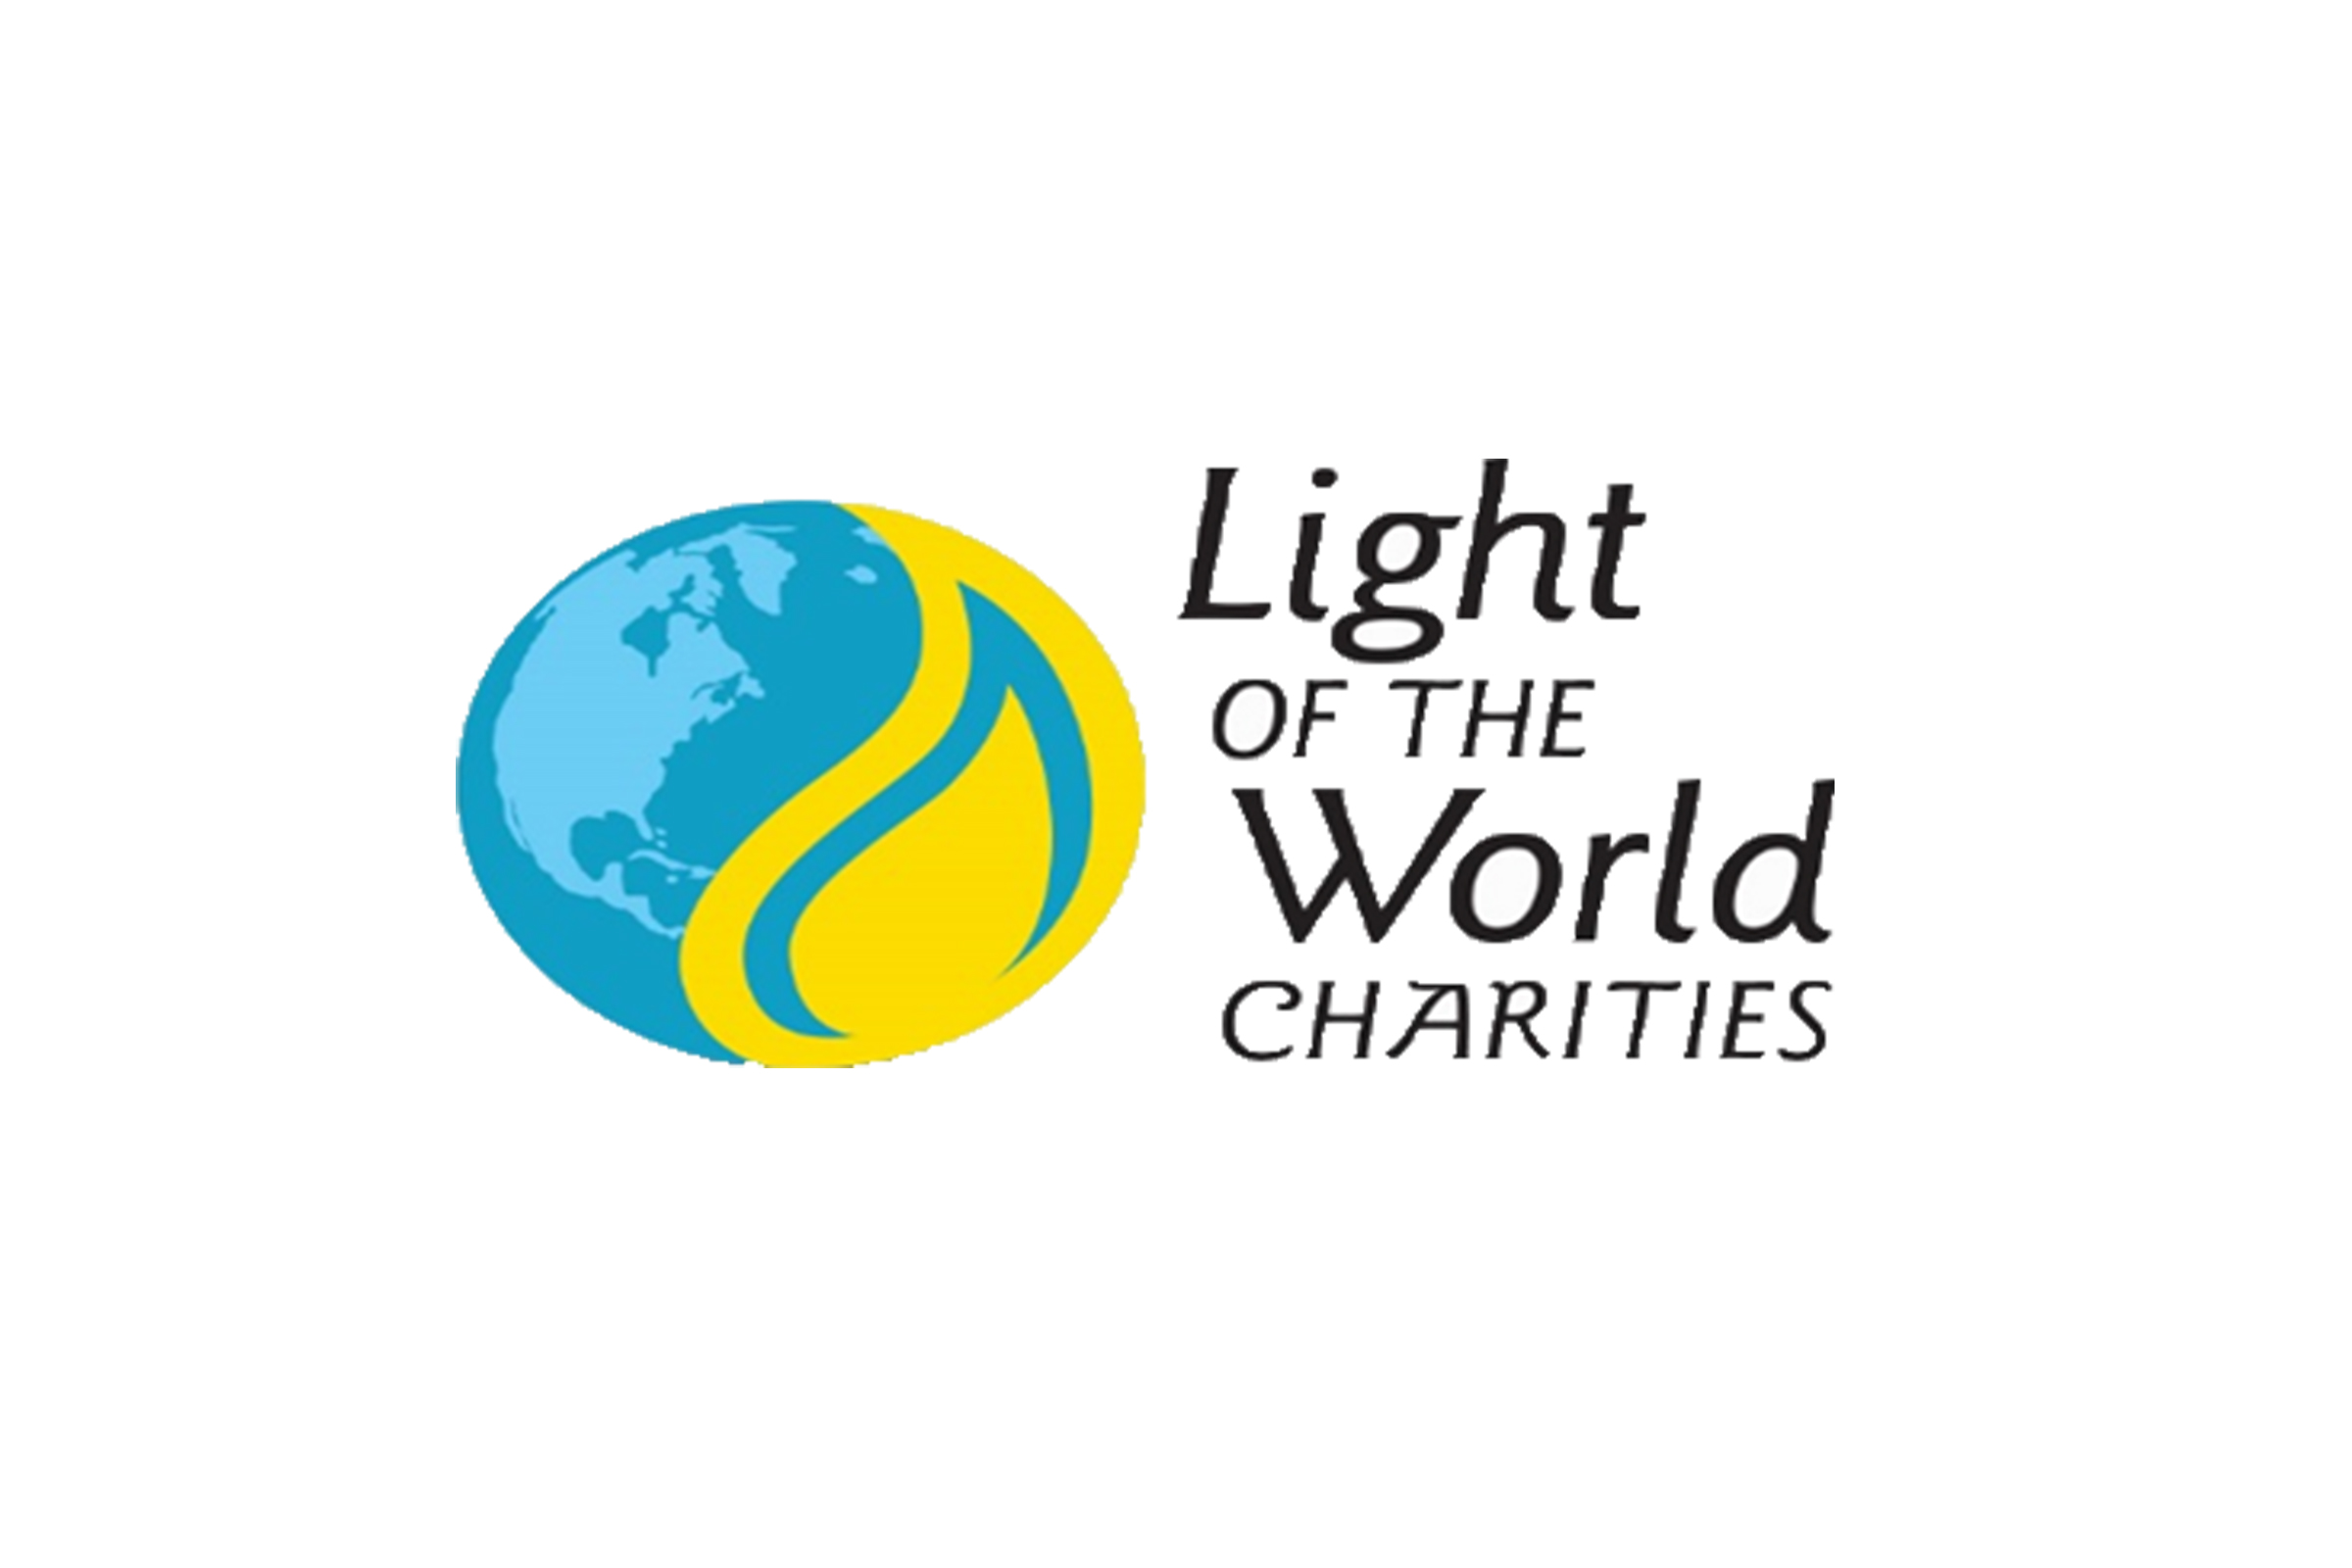 Light of the World Charities